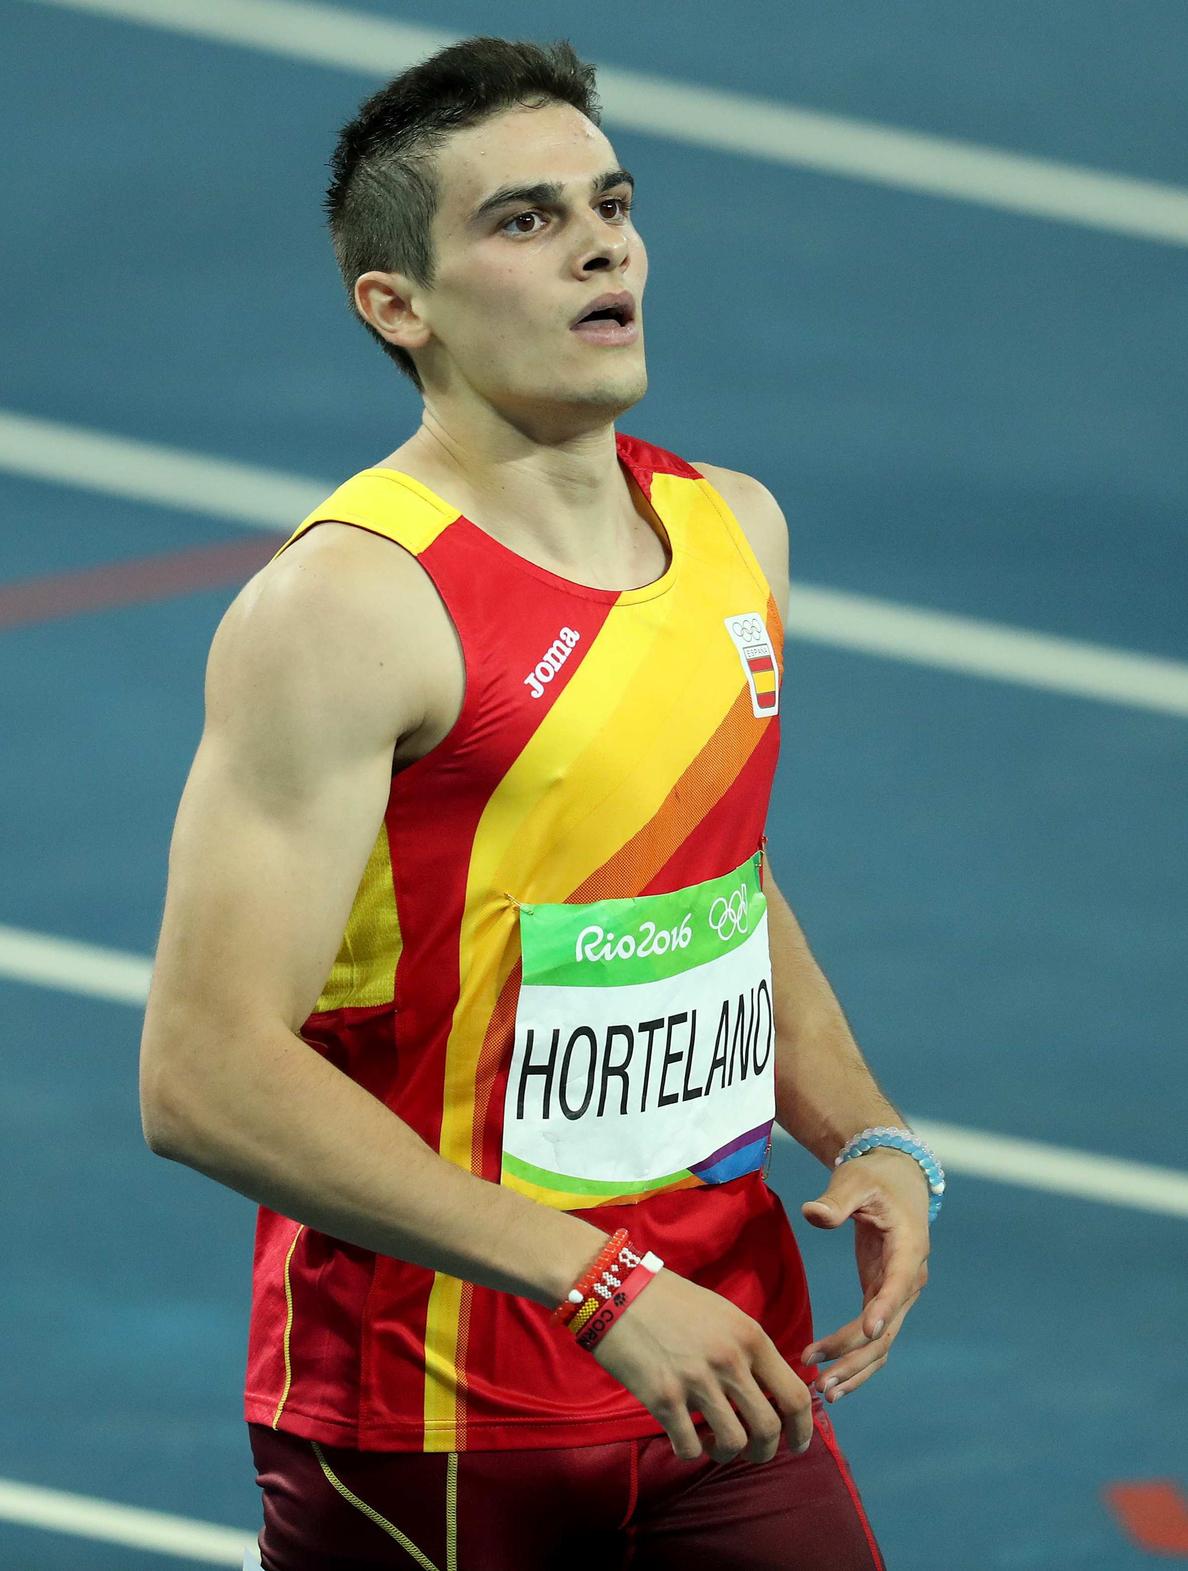 Hospital 12 de octubre dice que Bruno Hortelano «evoluciona favorablemente»